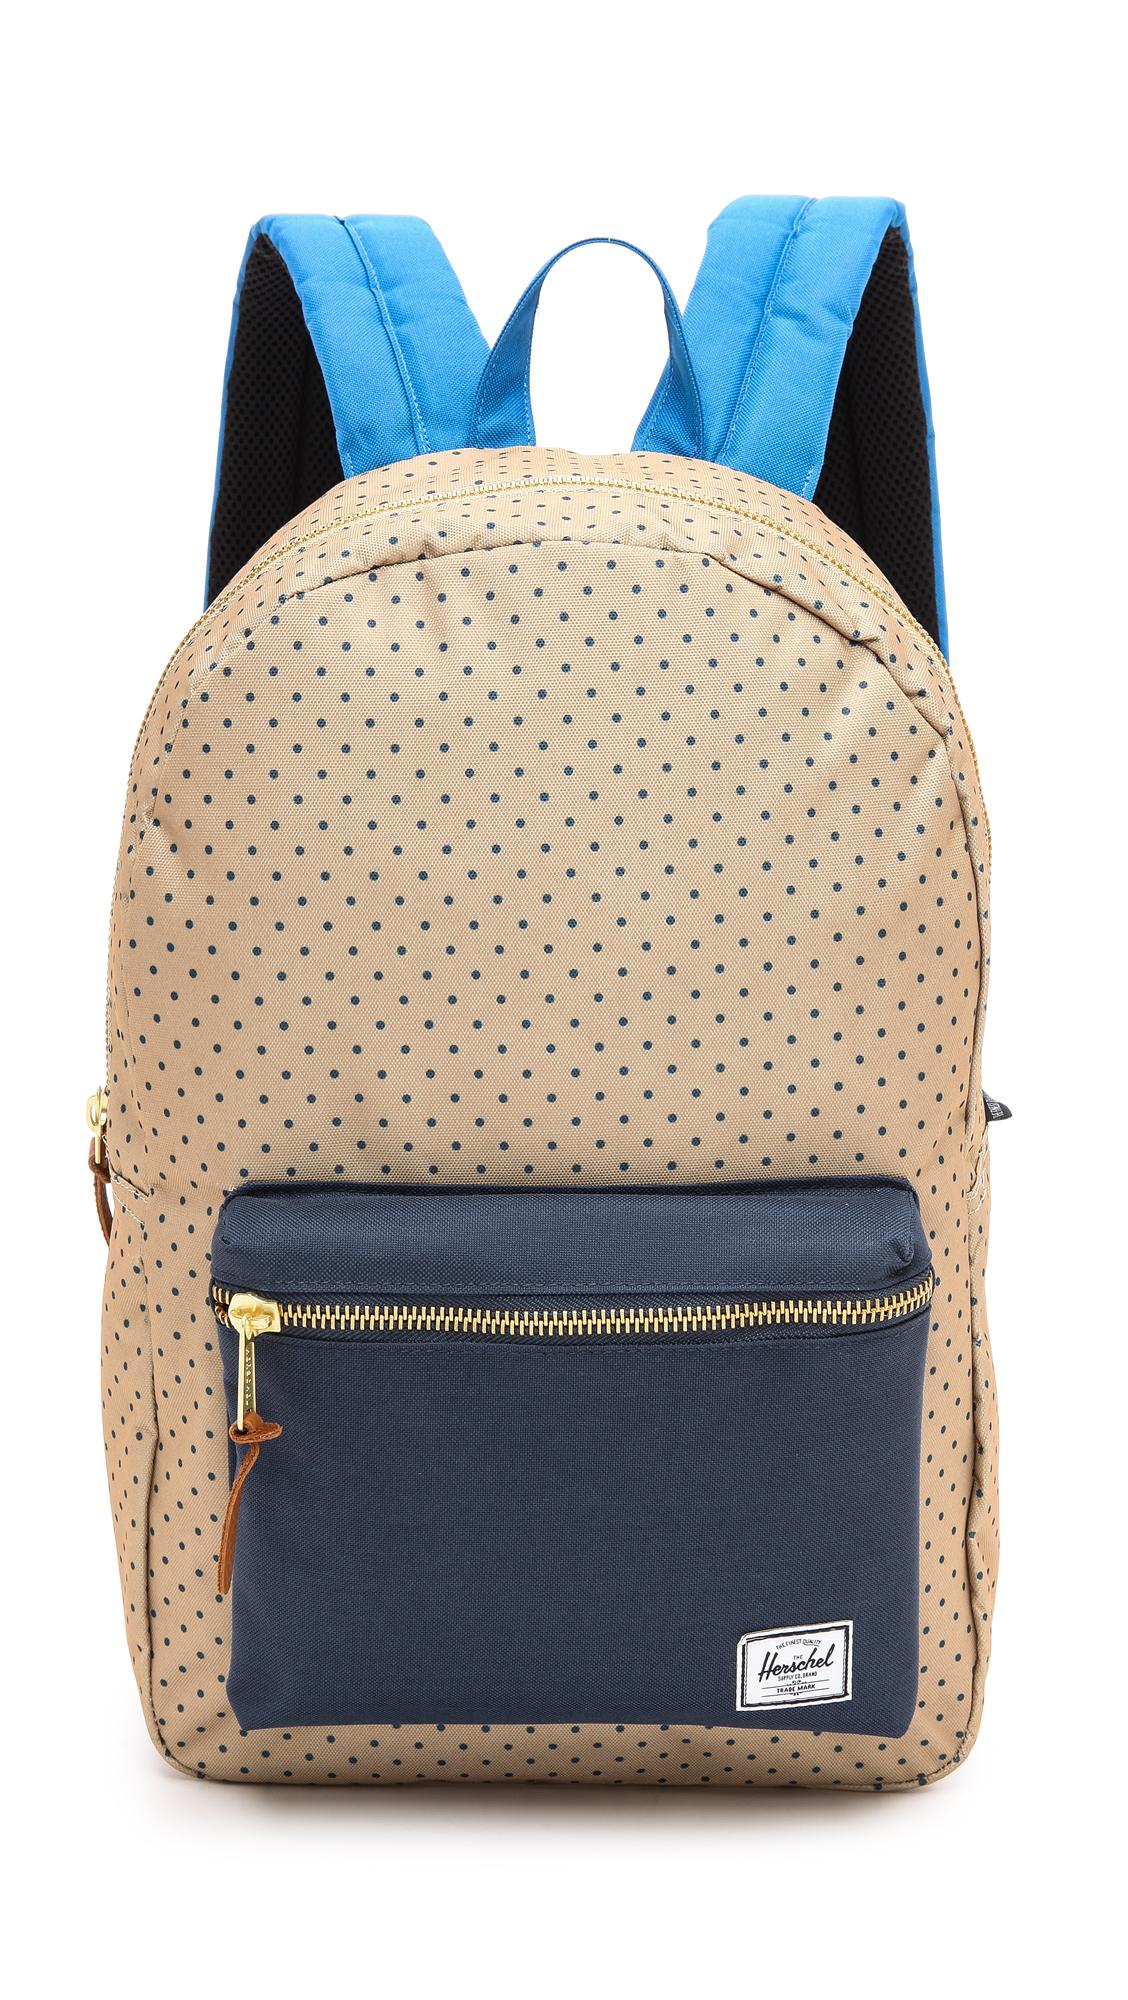 2dad291126f7 Lyst - Herschel Supply Co. Settlement Backpack Khaki Polka Dot in Blue